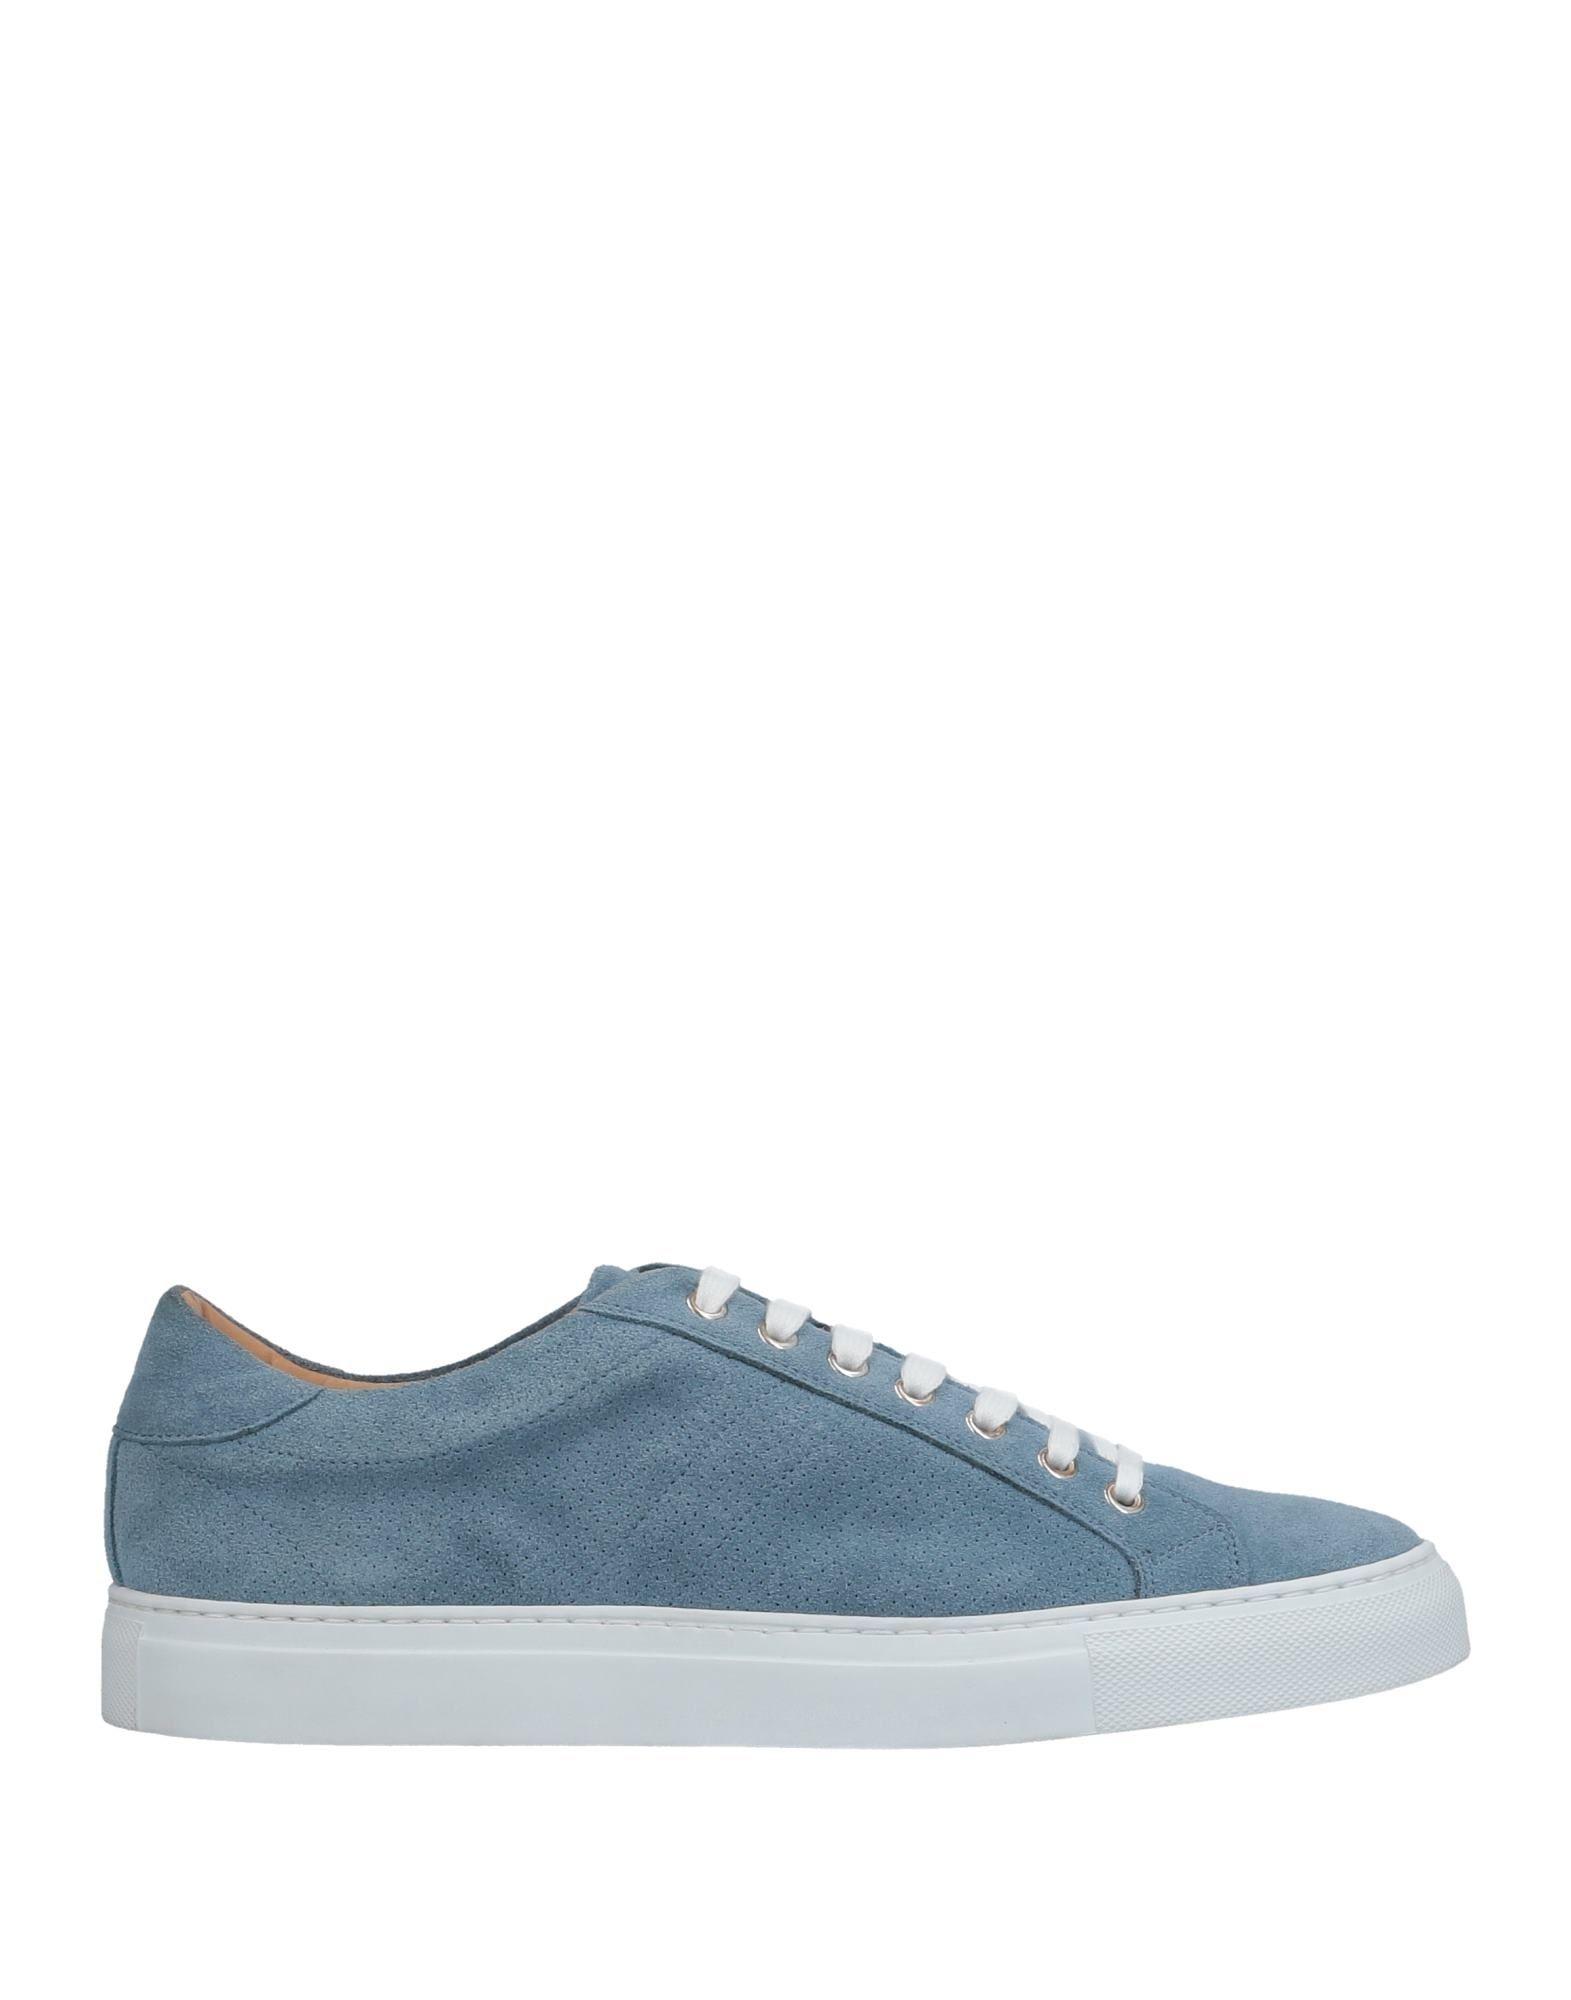 Pellettieri Di  Parma Sneakers Herren  11507955OD Gute Qualität beliebte Schuhe